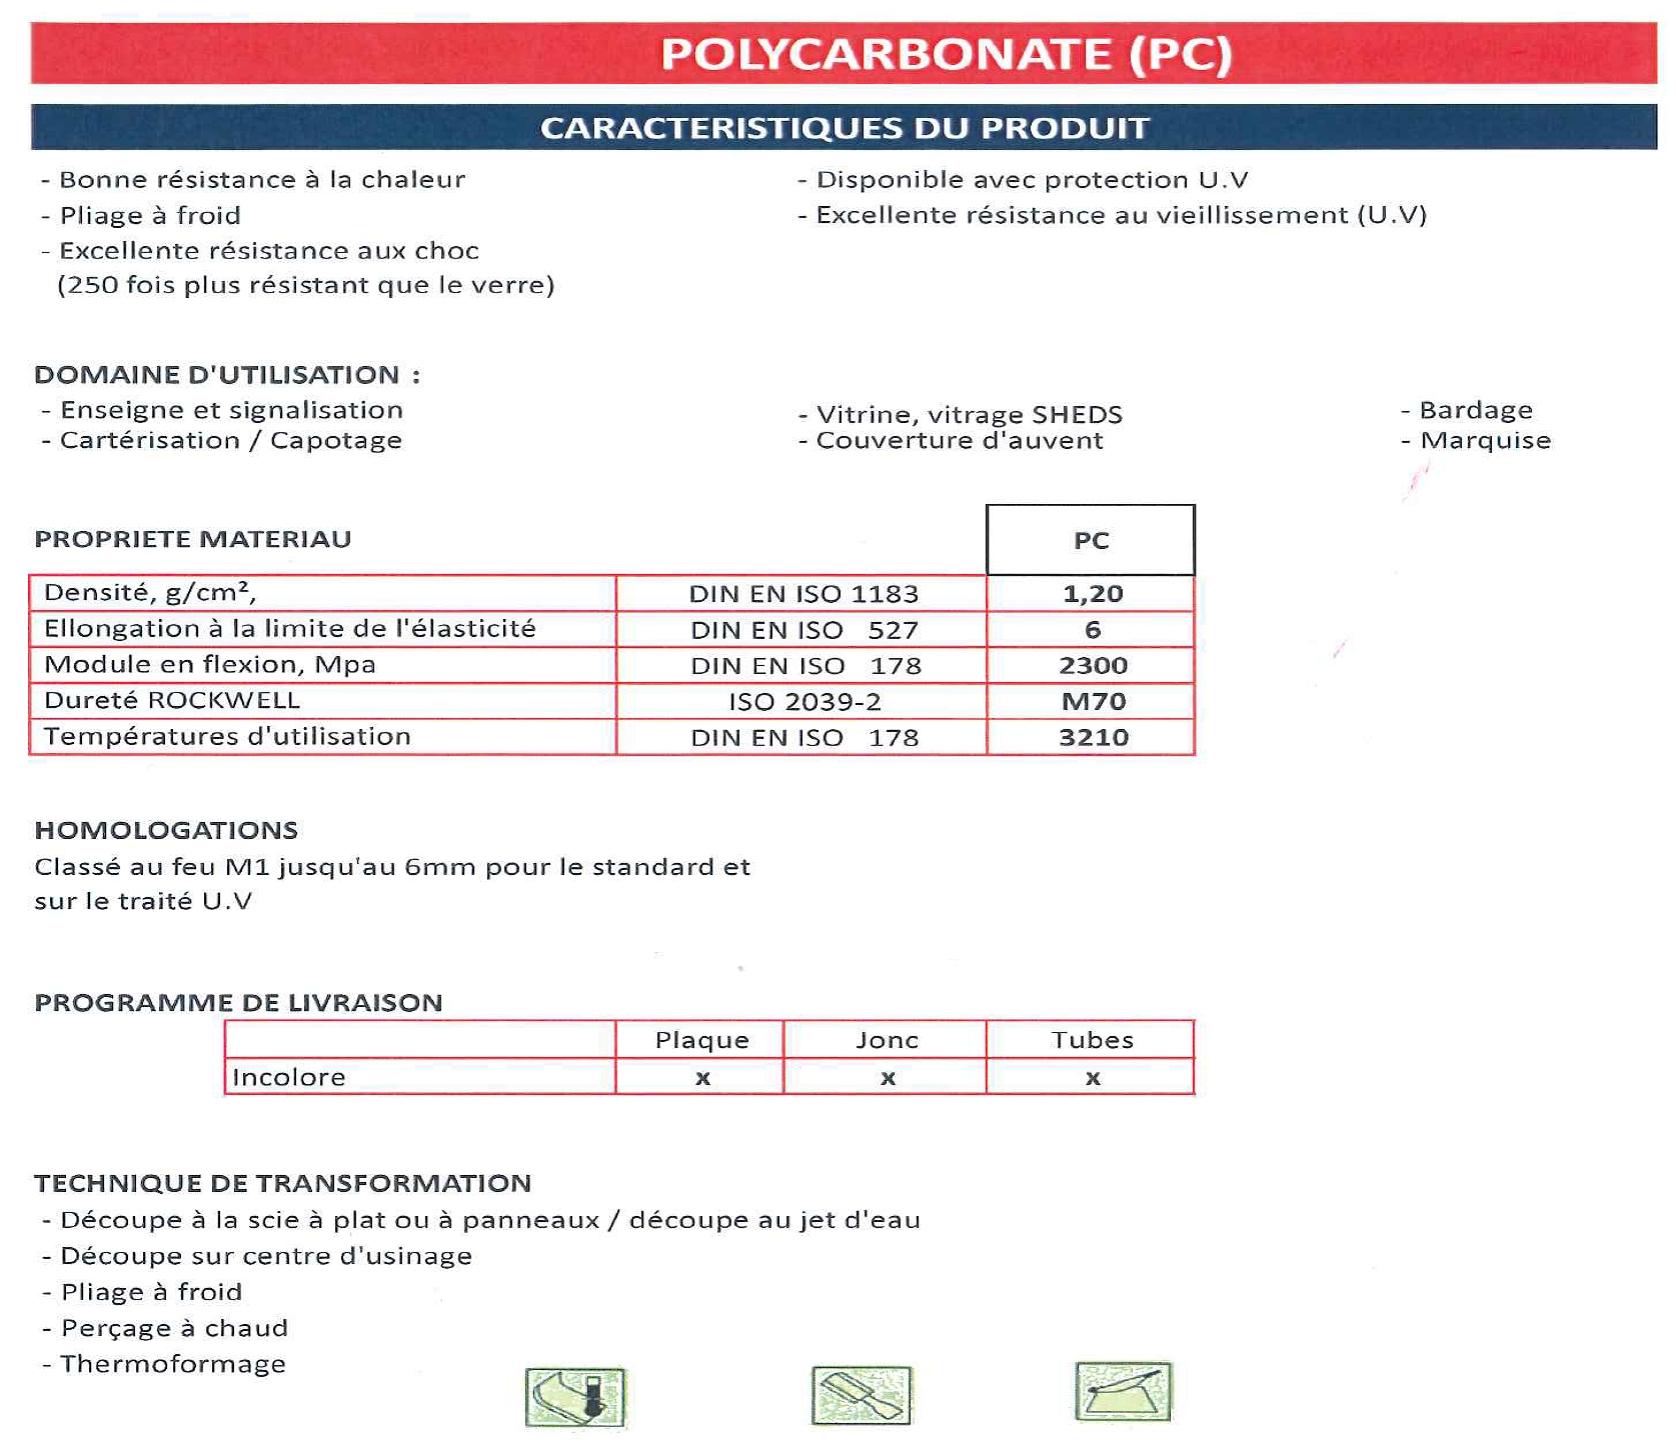 4. PolyCarbonate PC